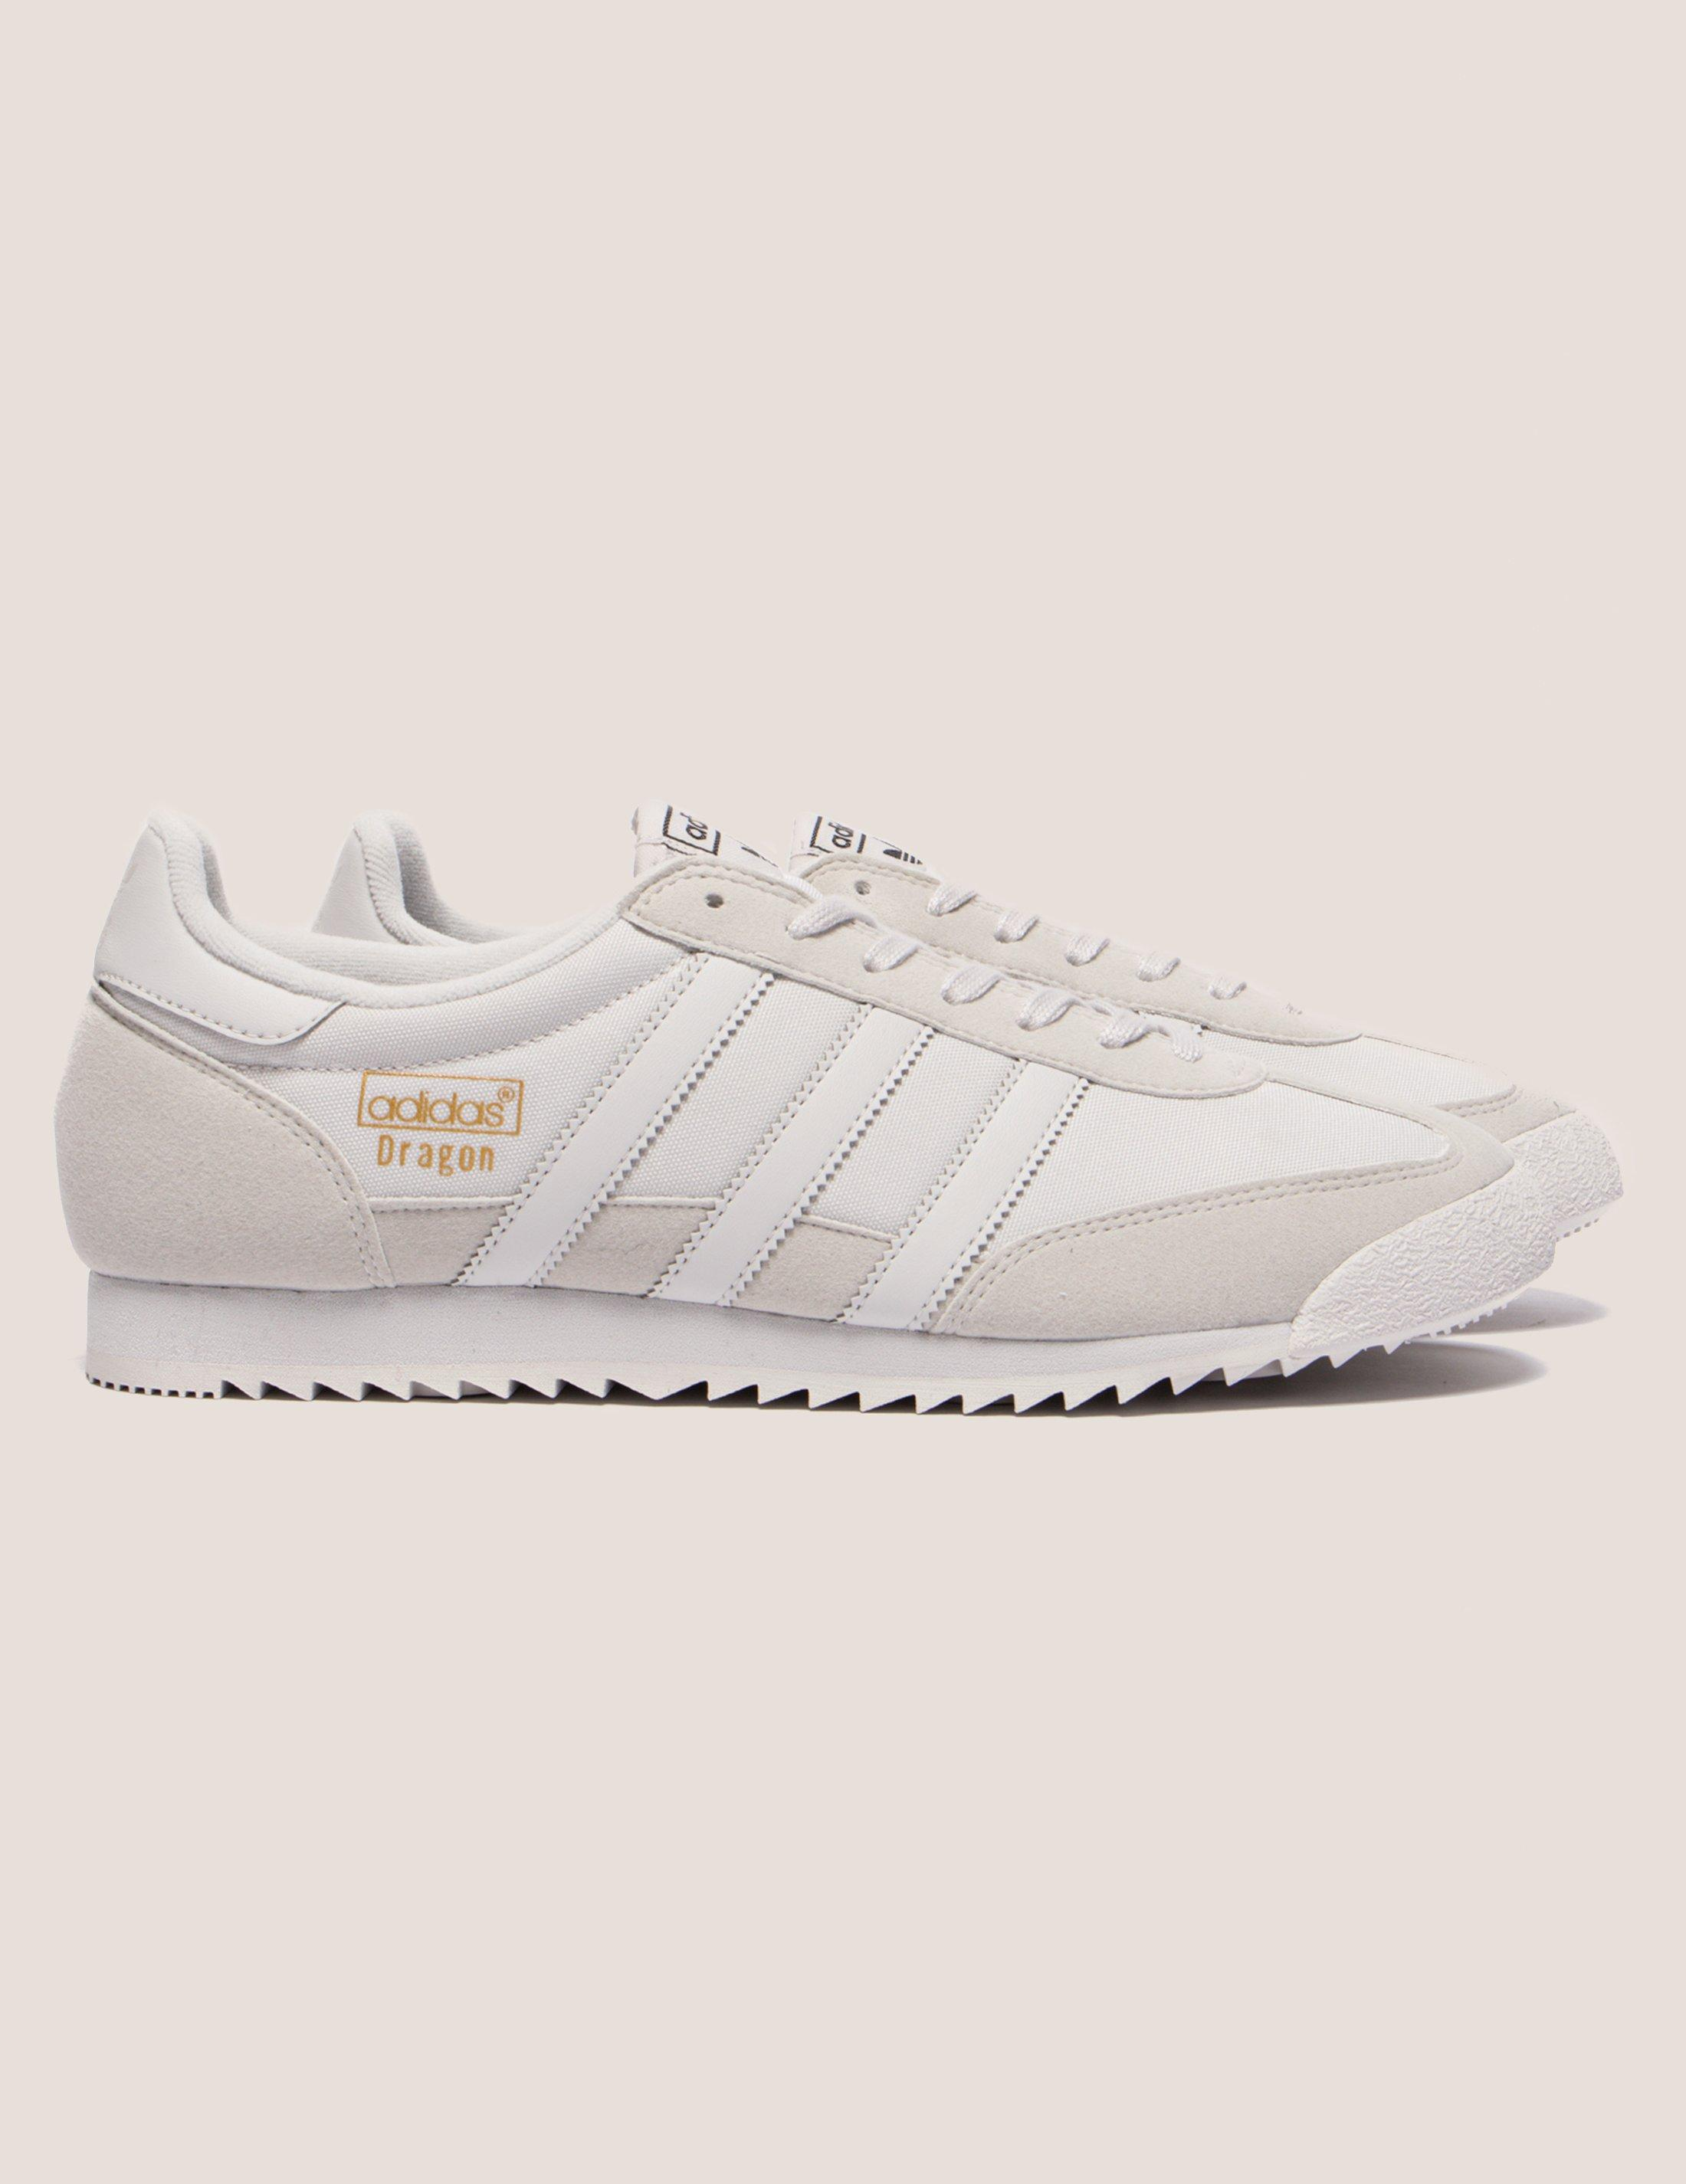 adidas dragons white